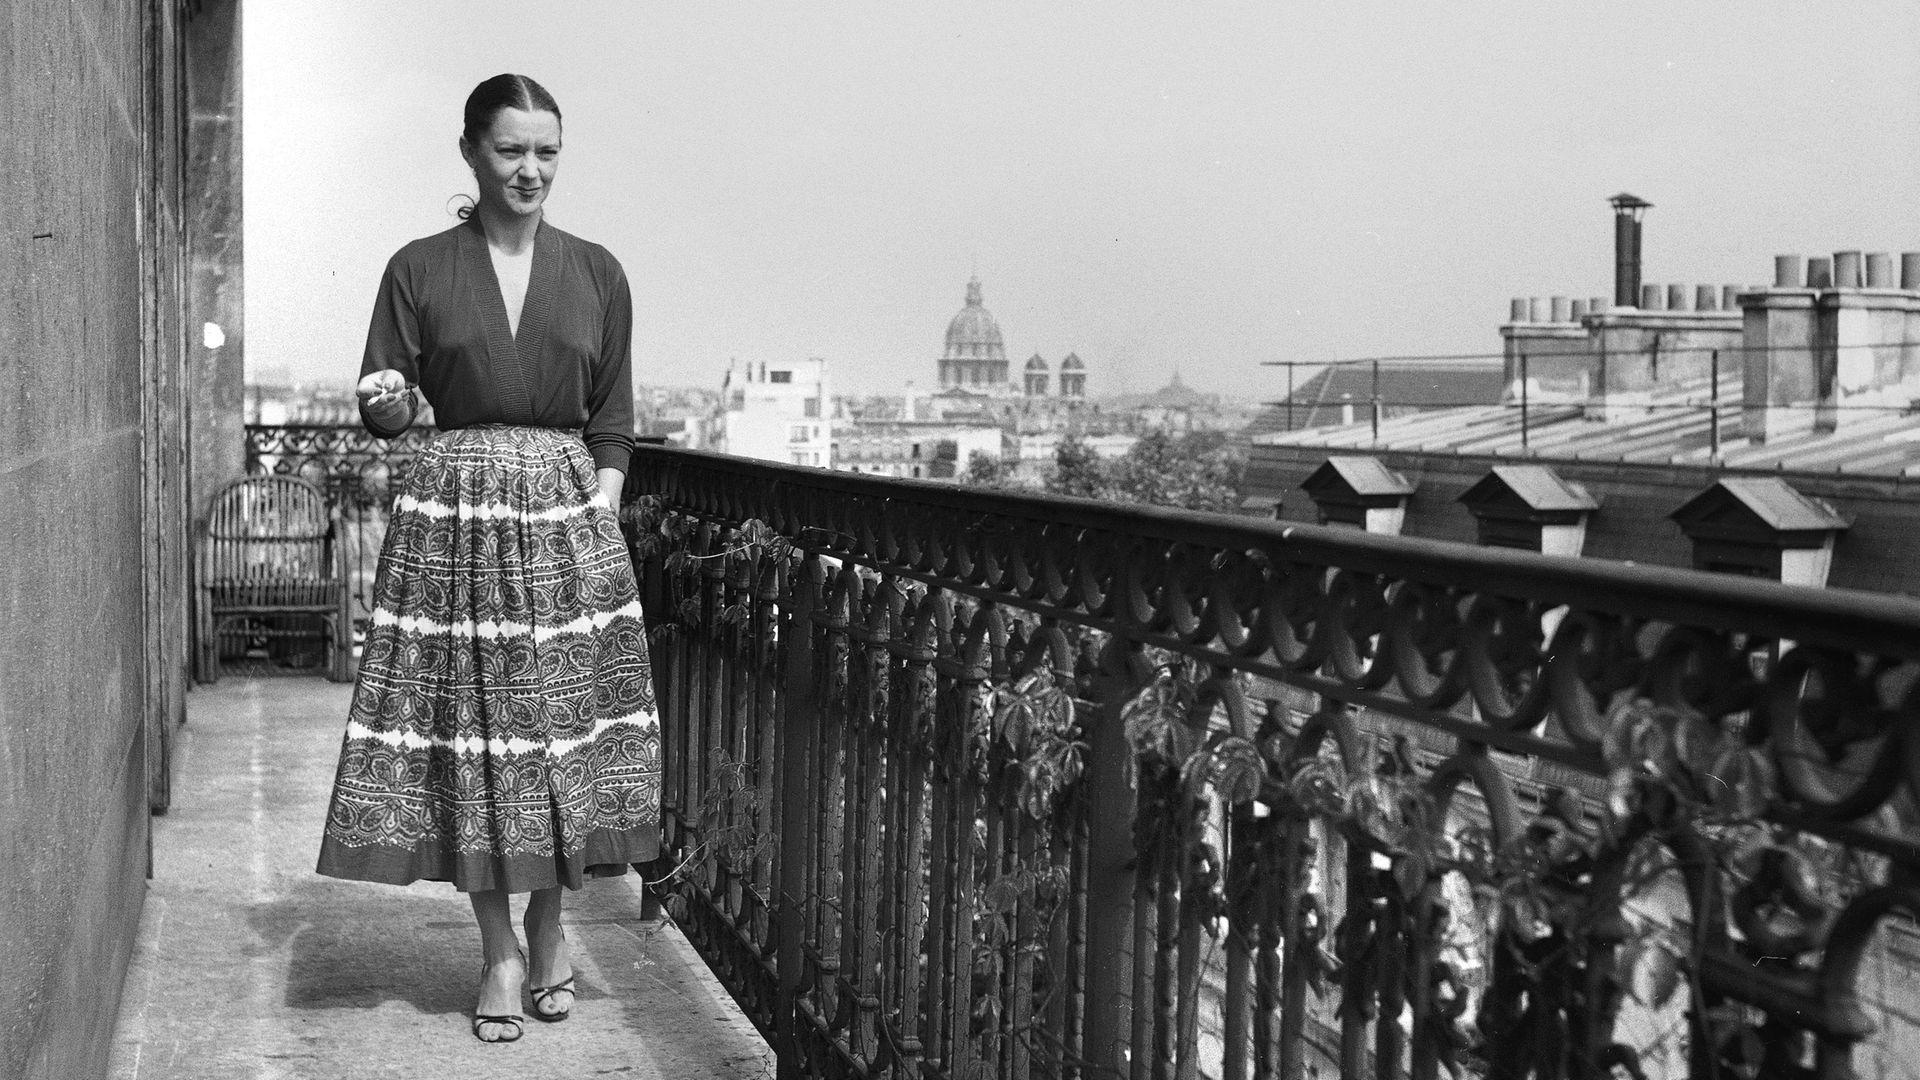 Actress Maria Casares (1922-1996) - Credit: Roger Viollet via Getty Images